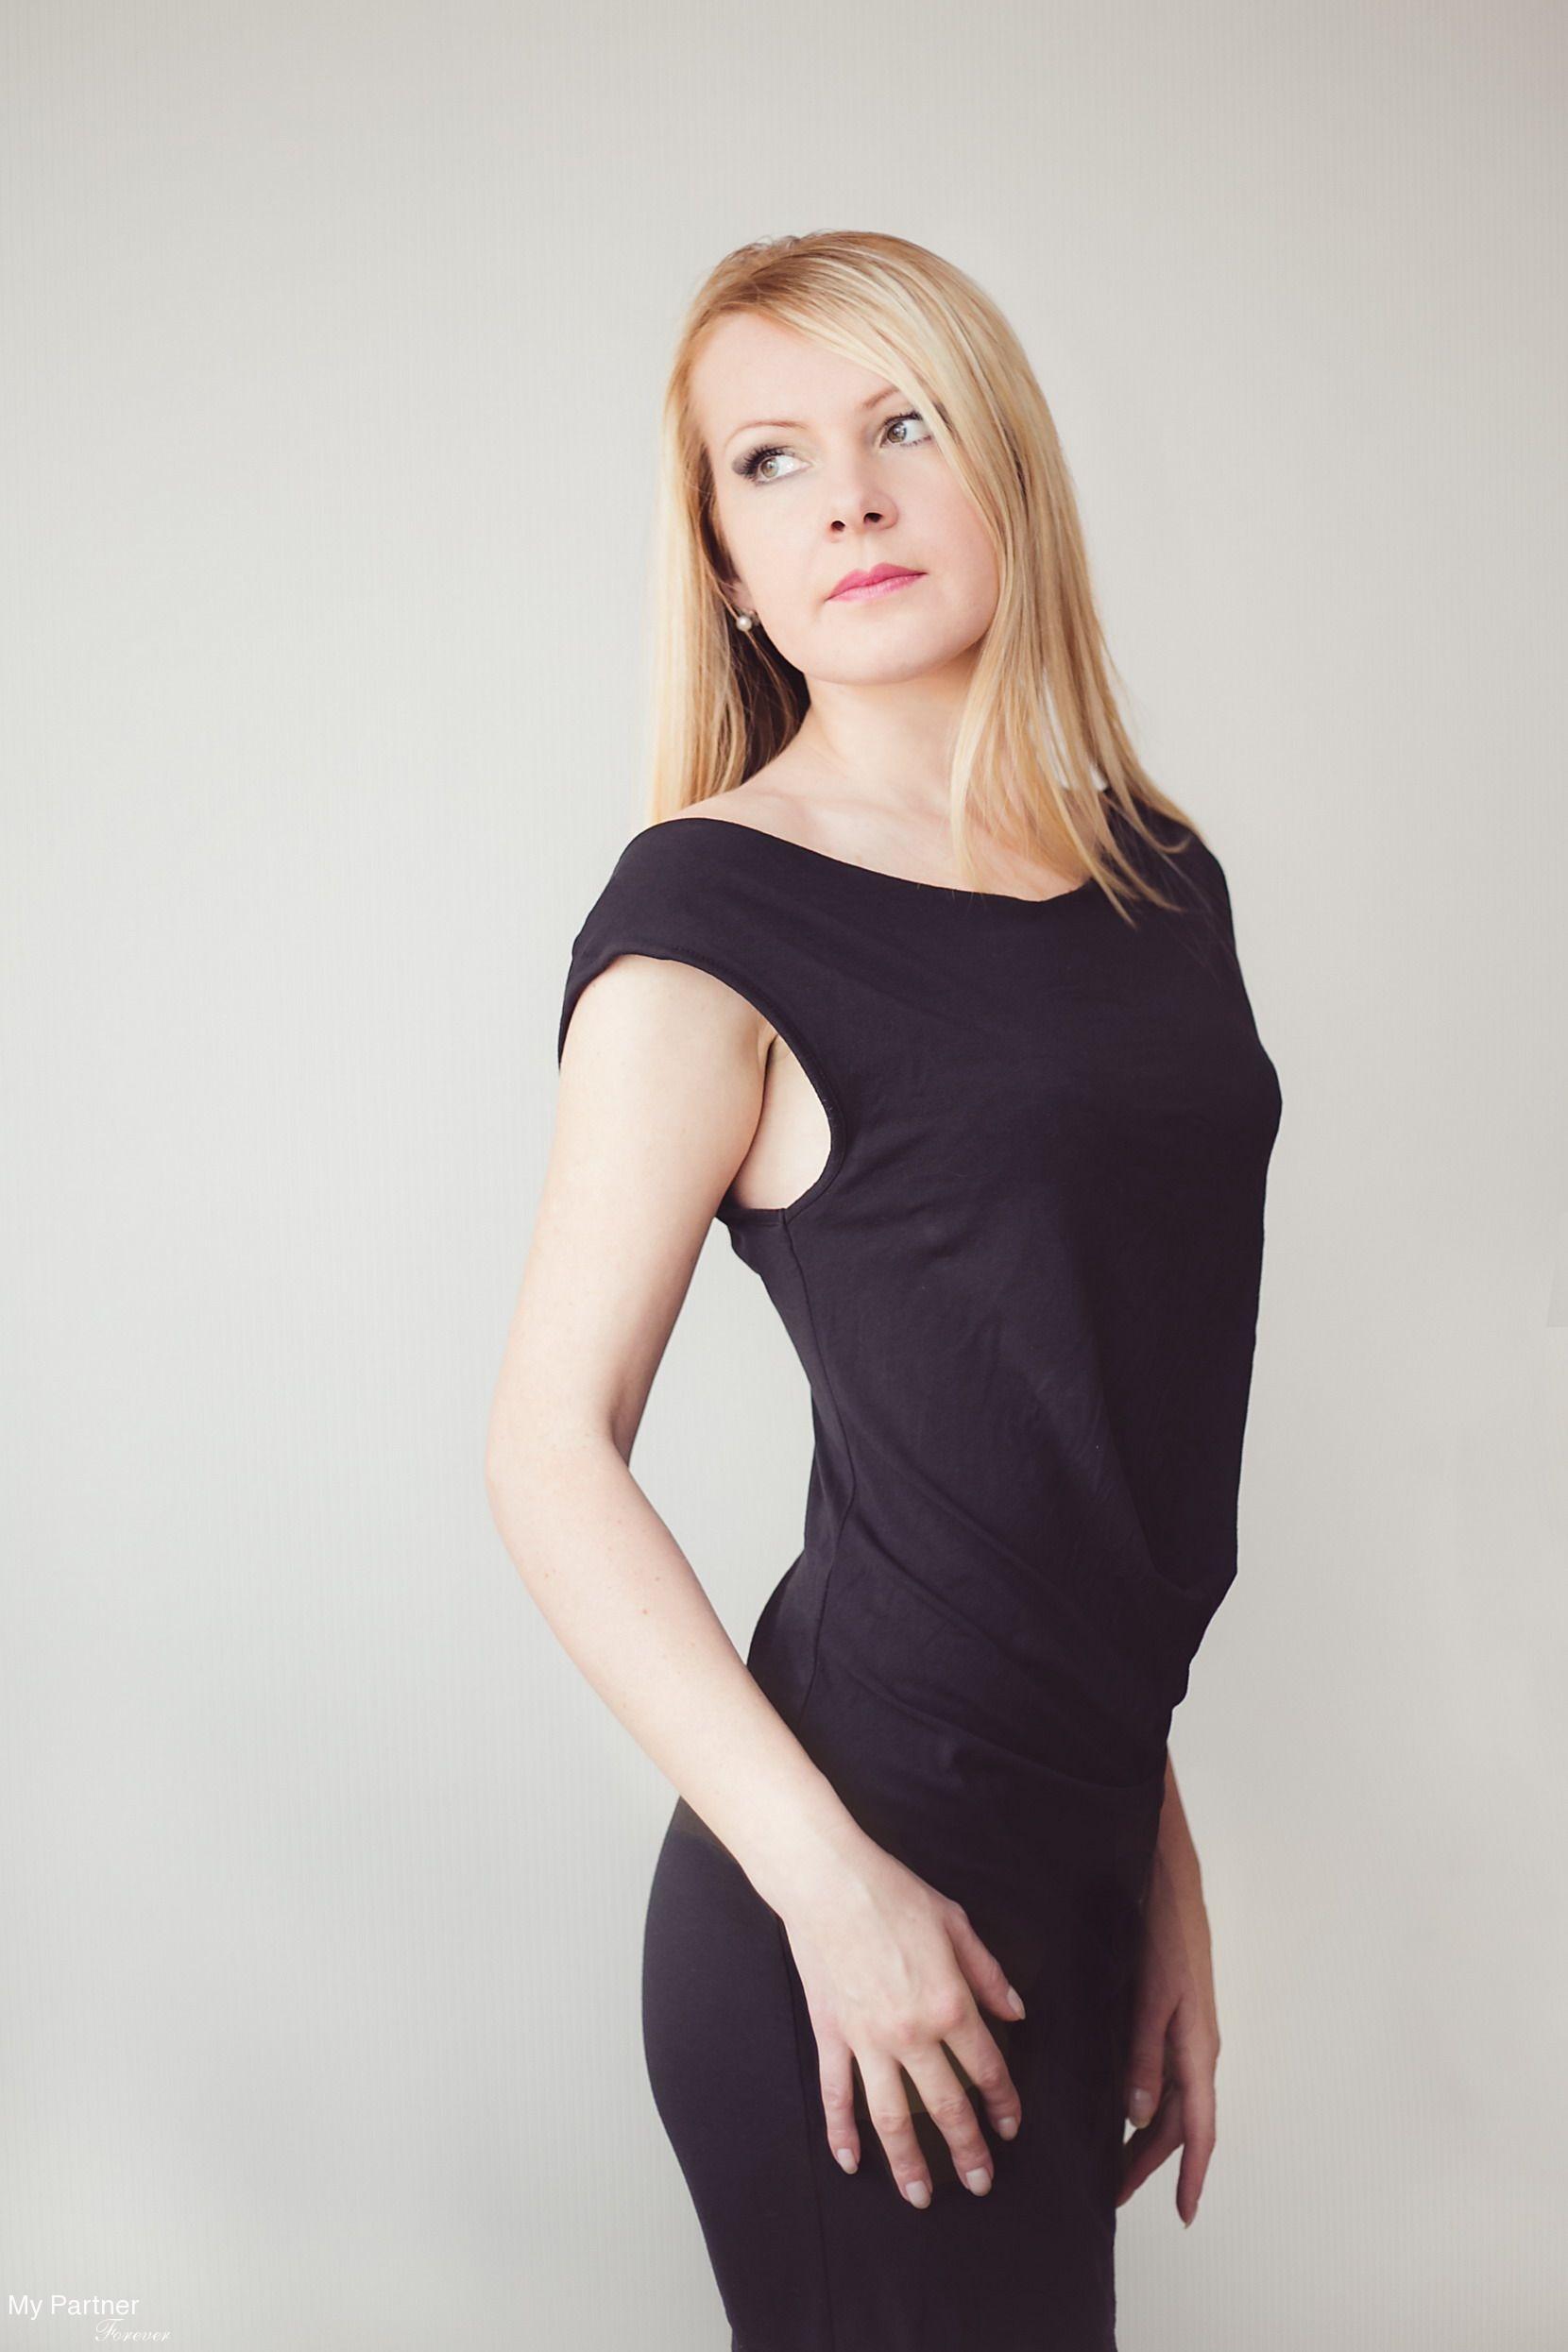 Stunning Belarusian Woman Nataliya from Grodno, Belarus